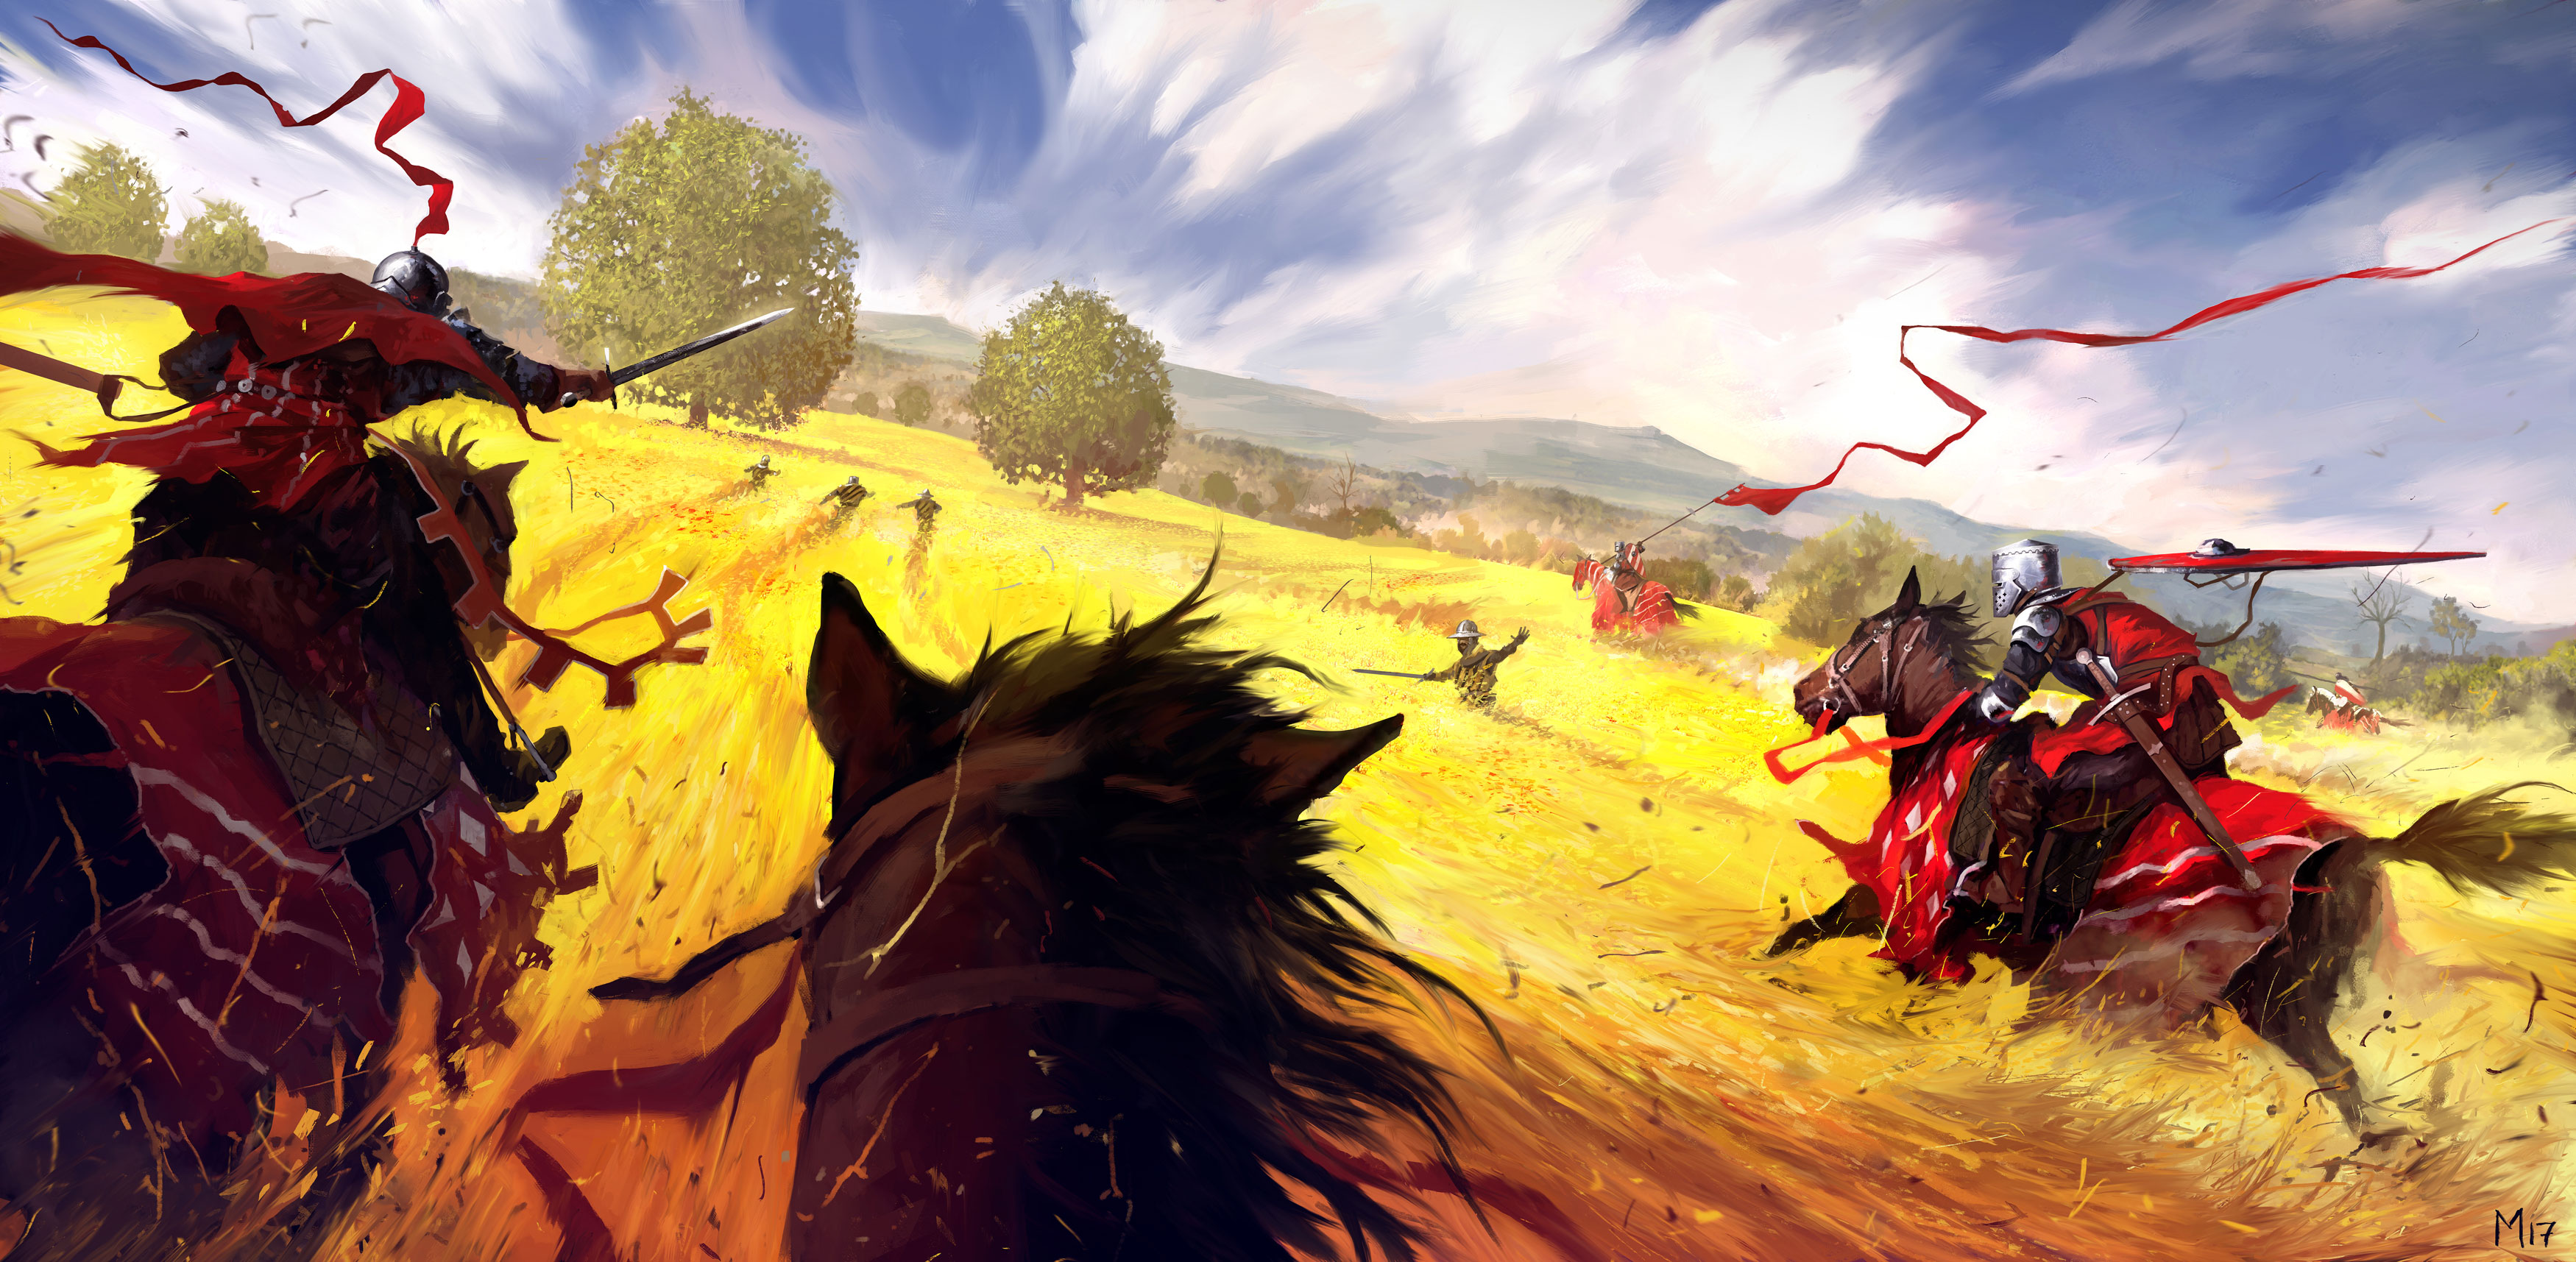 Field Horse Knight Sword Warrior 3500x1715